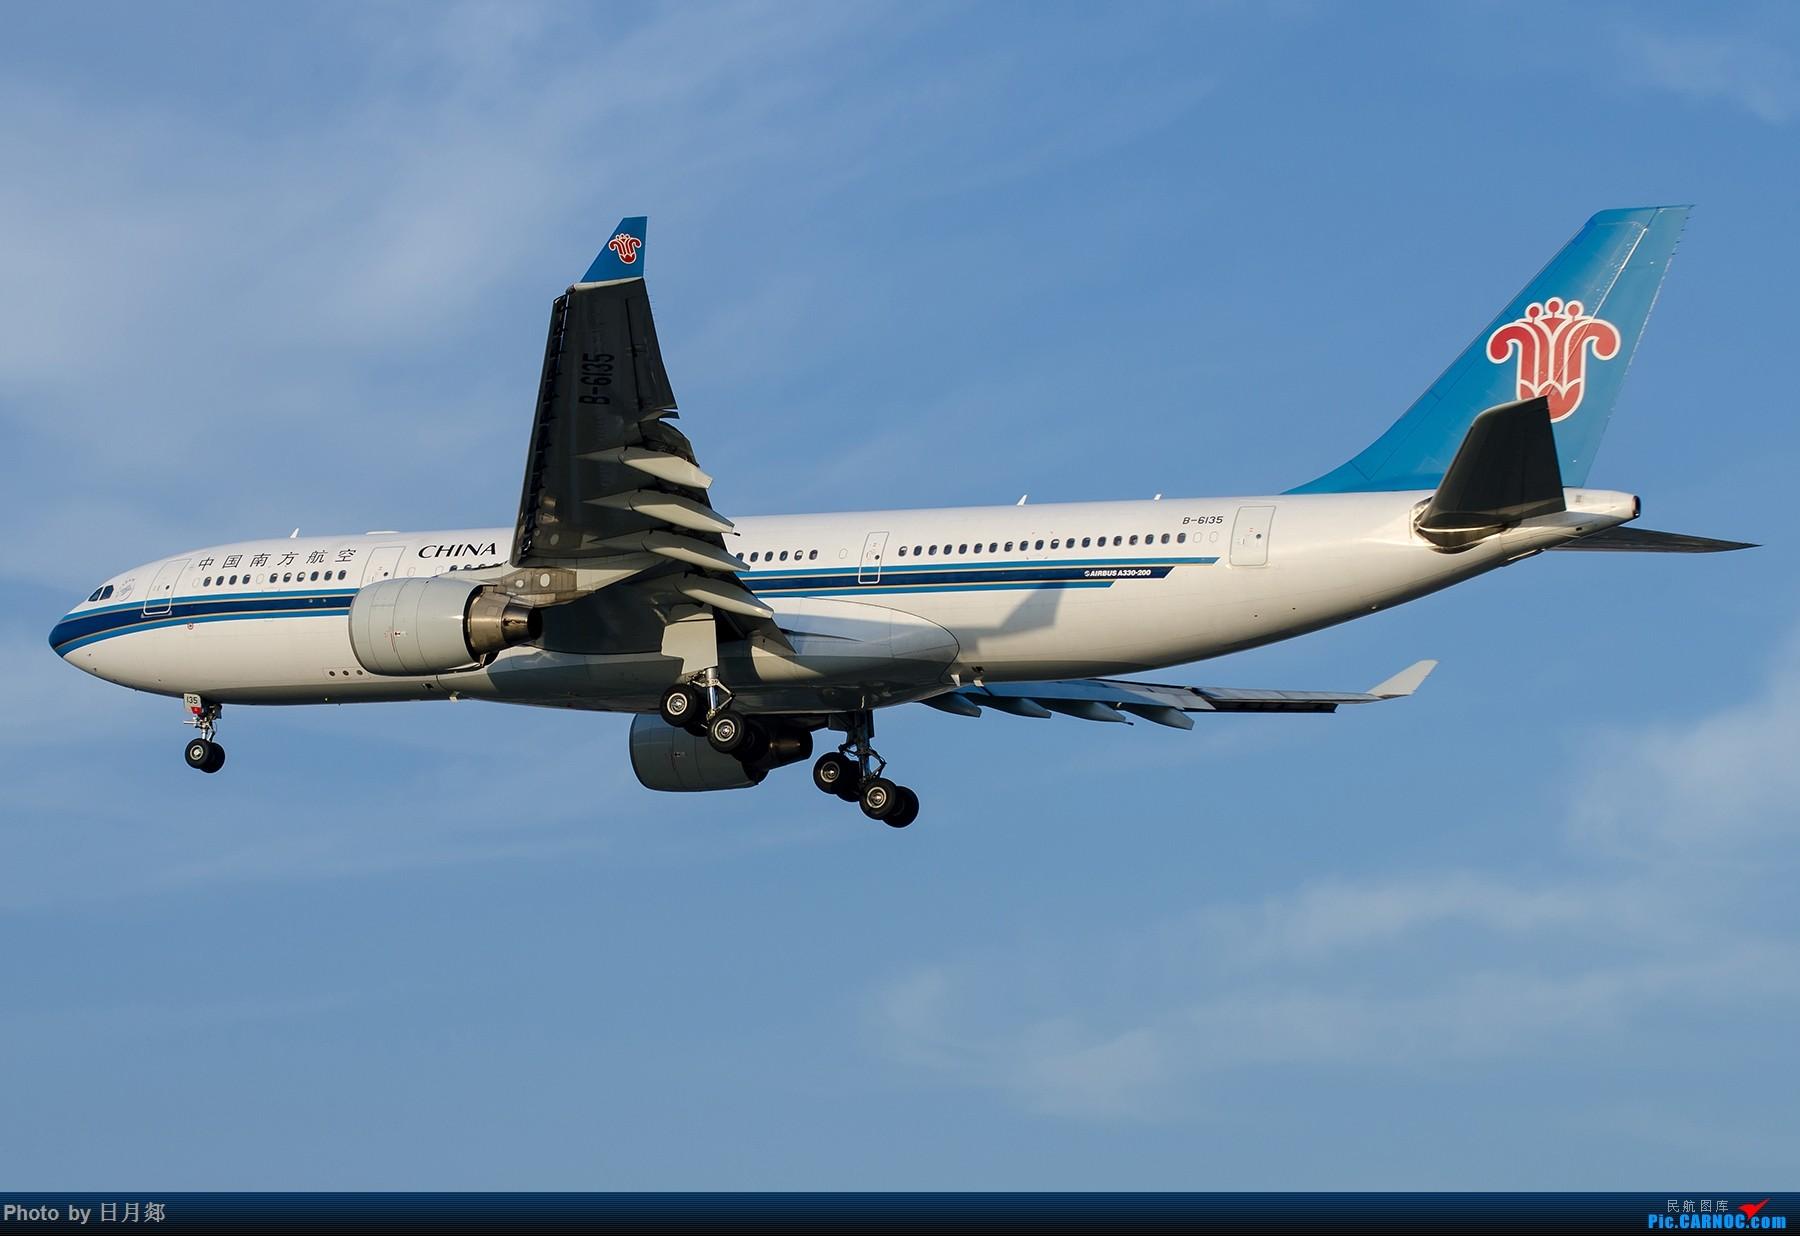 Re:[原创]【SHA拍机*1800大图】轻度污染来临前宝贵的蓝天,且拍且珍惜 AIRBUS A330-200 B-6135 中国上海虹桥国际机场